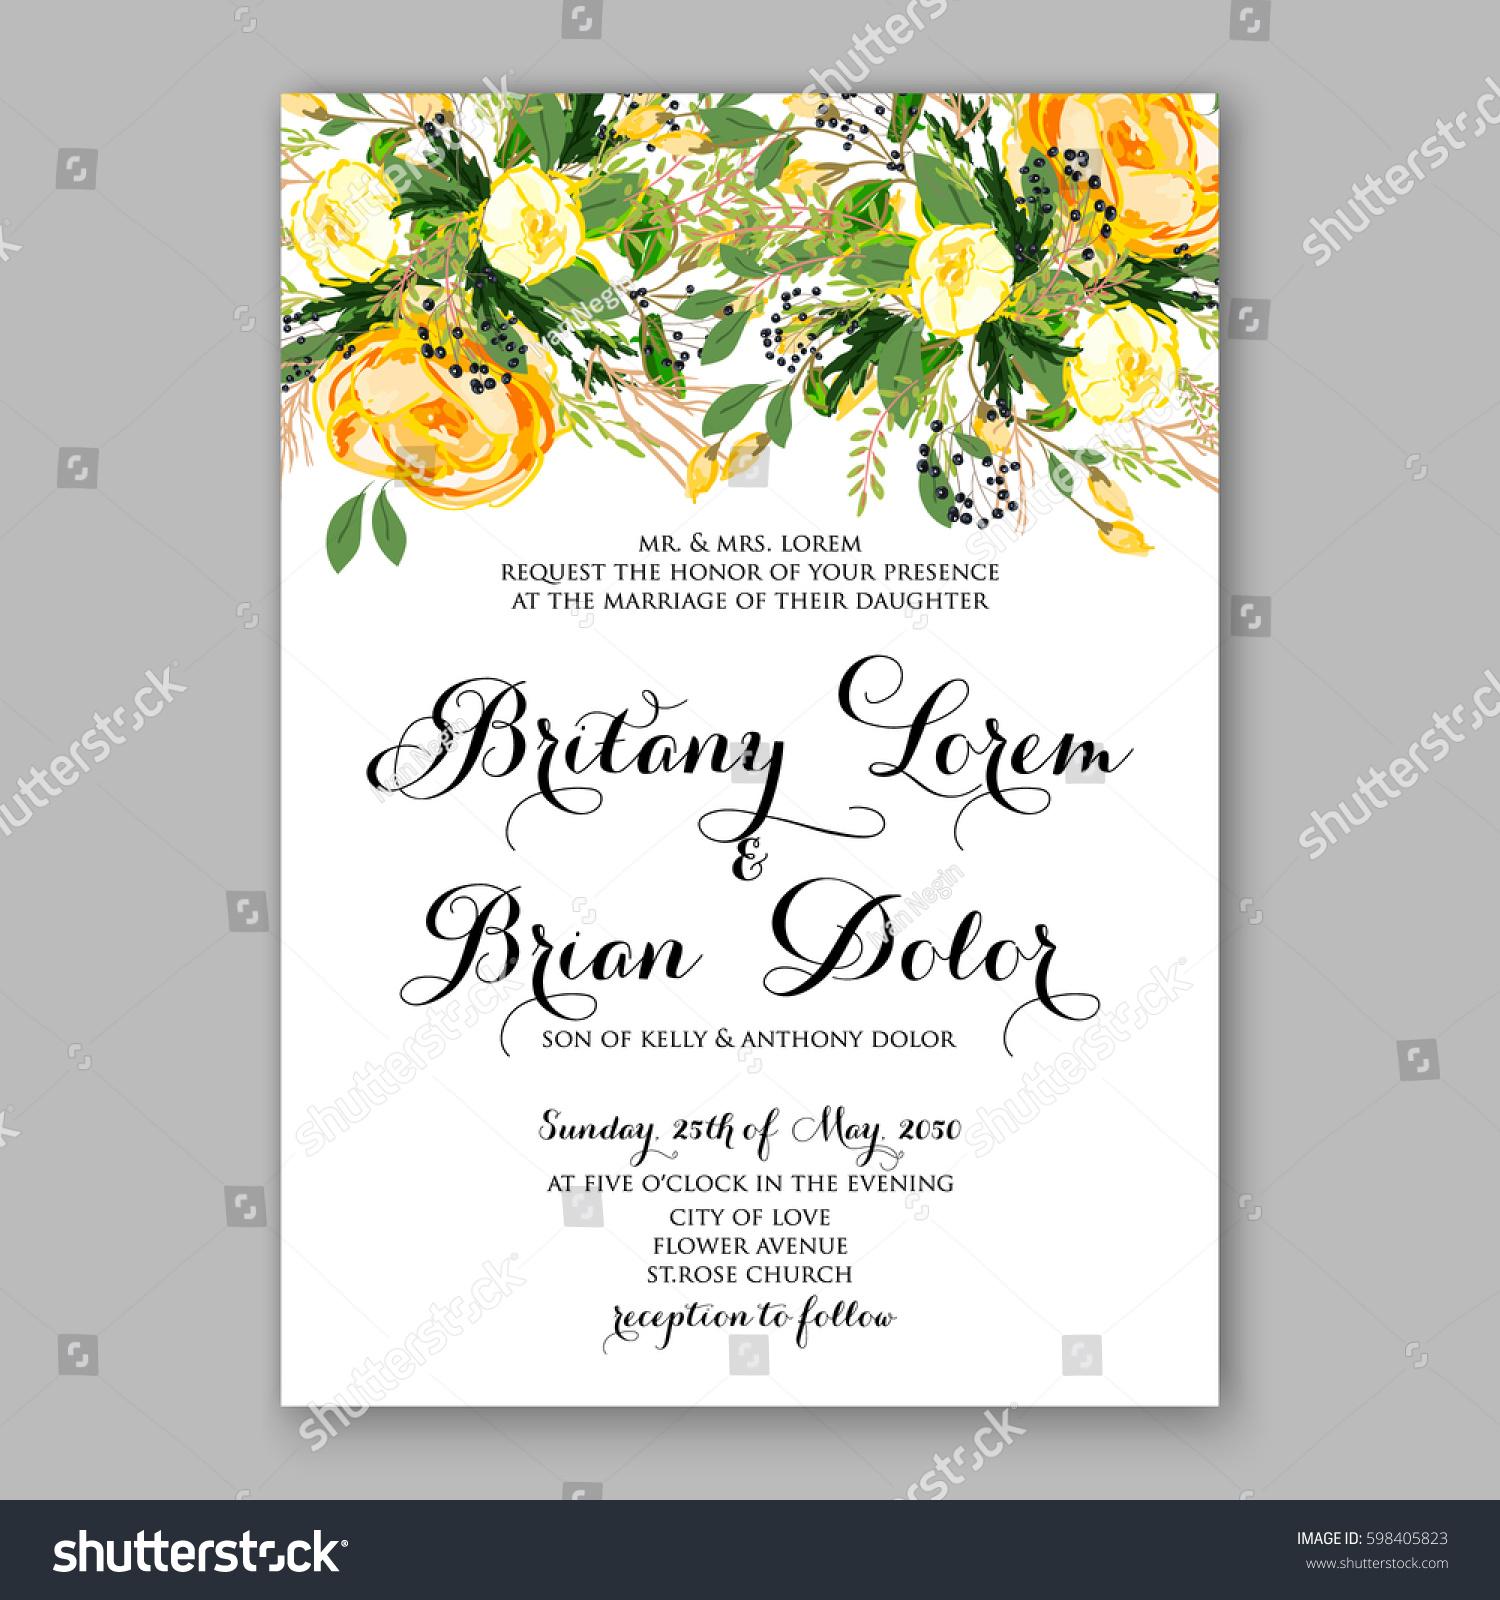 Wedding Invitation Card Template Yellow Rose Stock Vector (Royalty ...